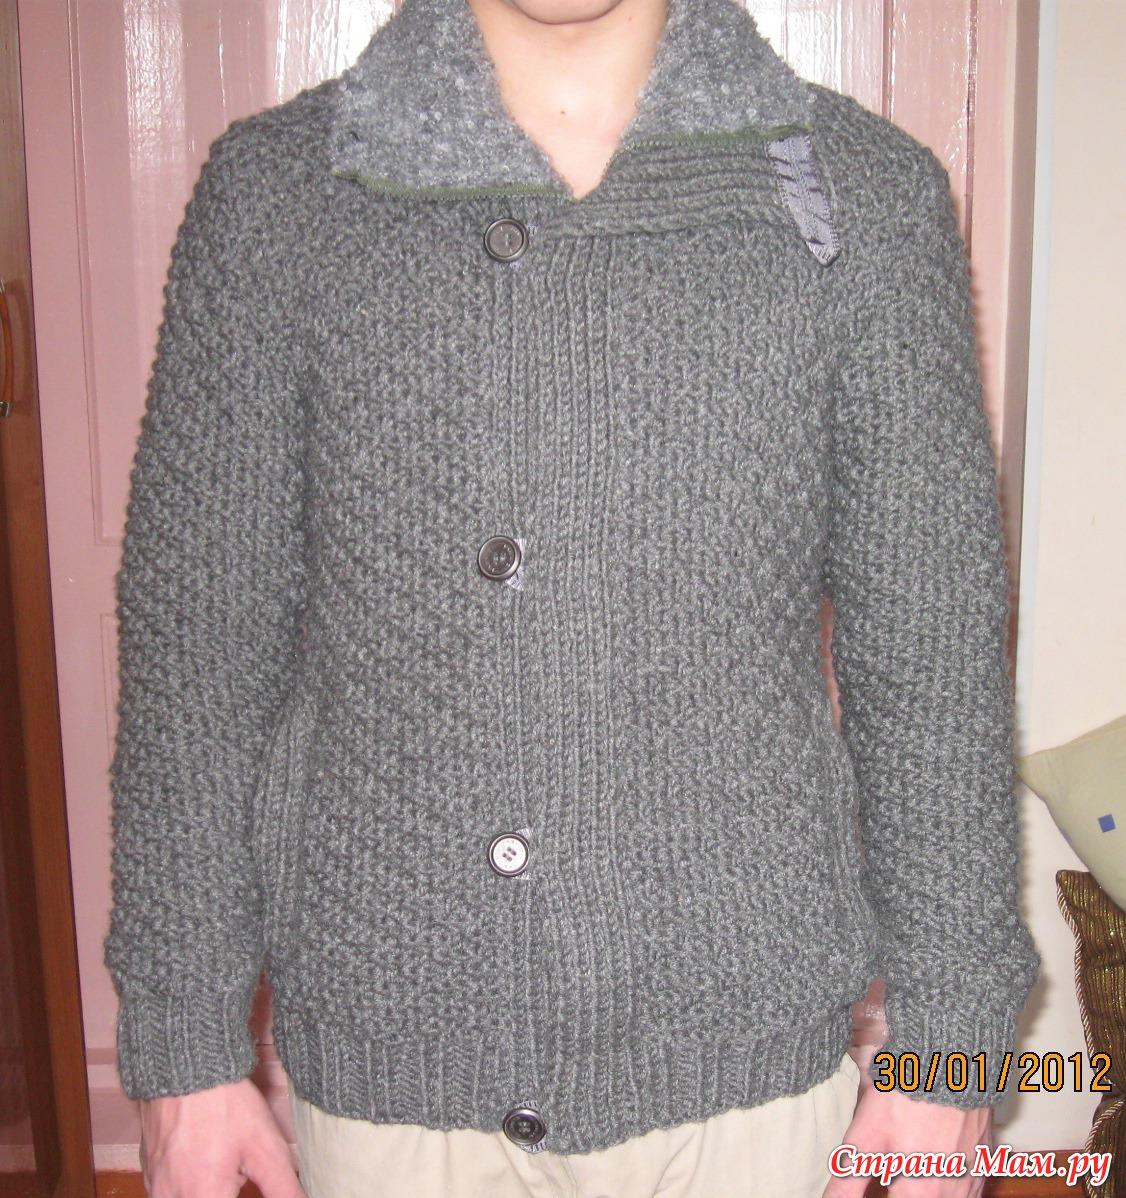 Куртка мужская. - Вязание - Страна Мам